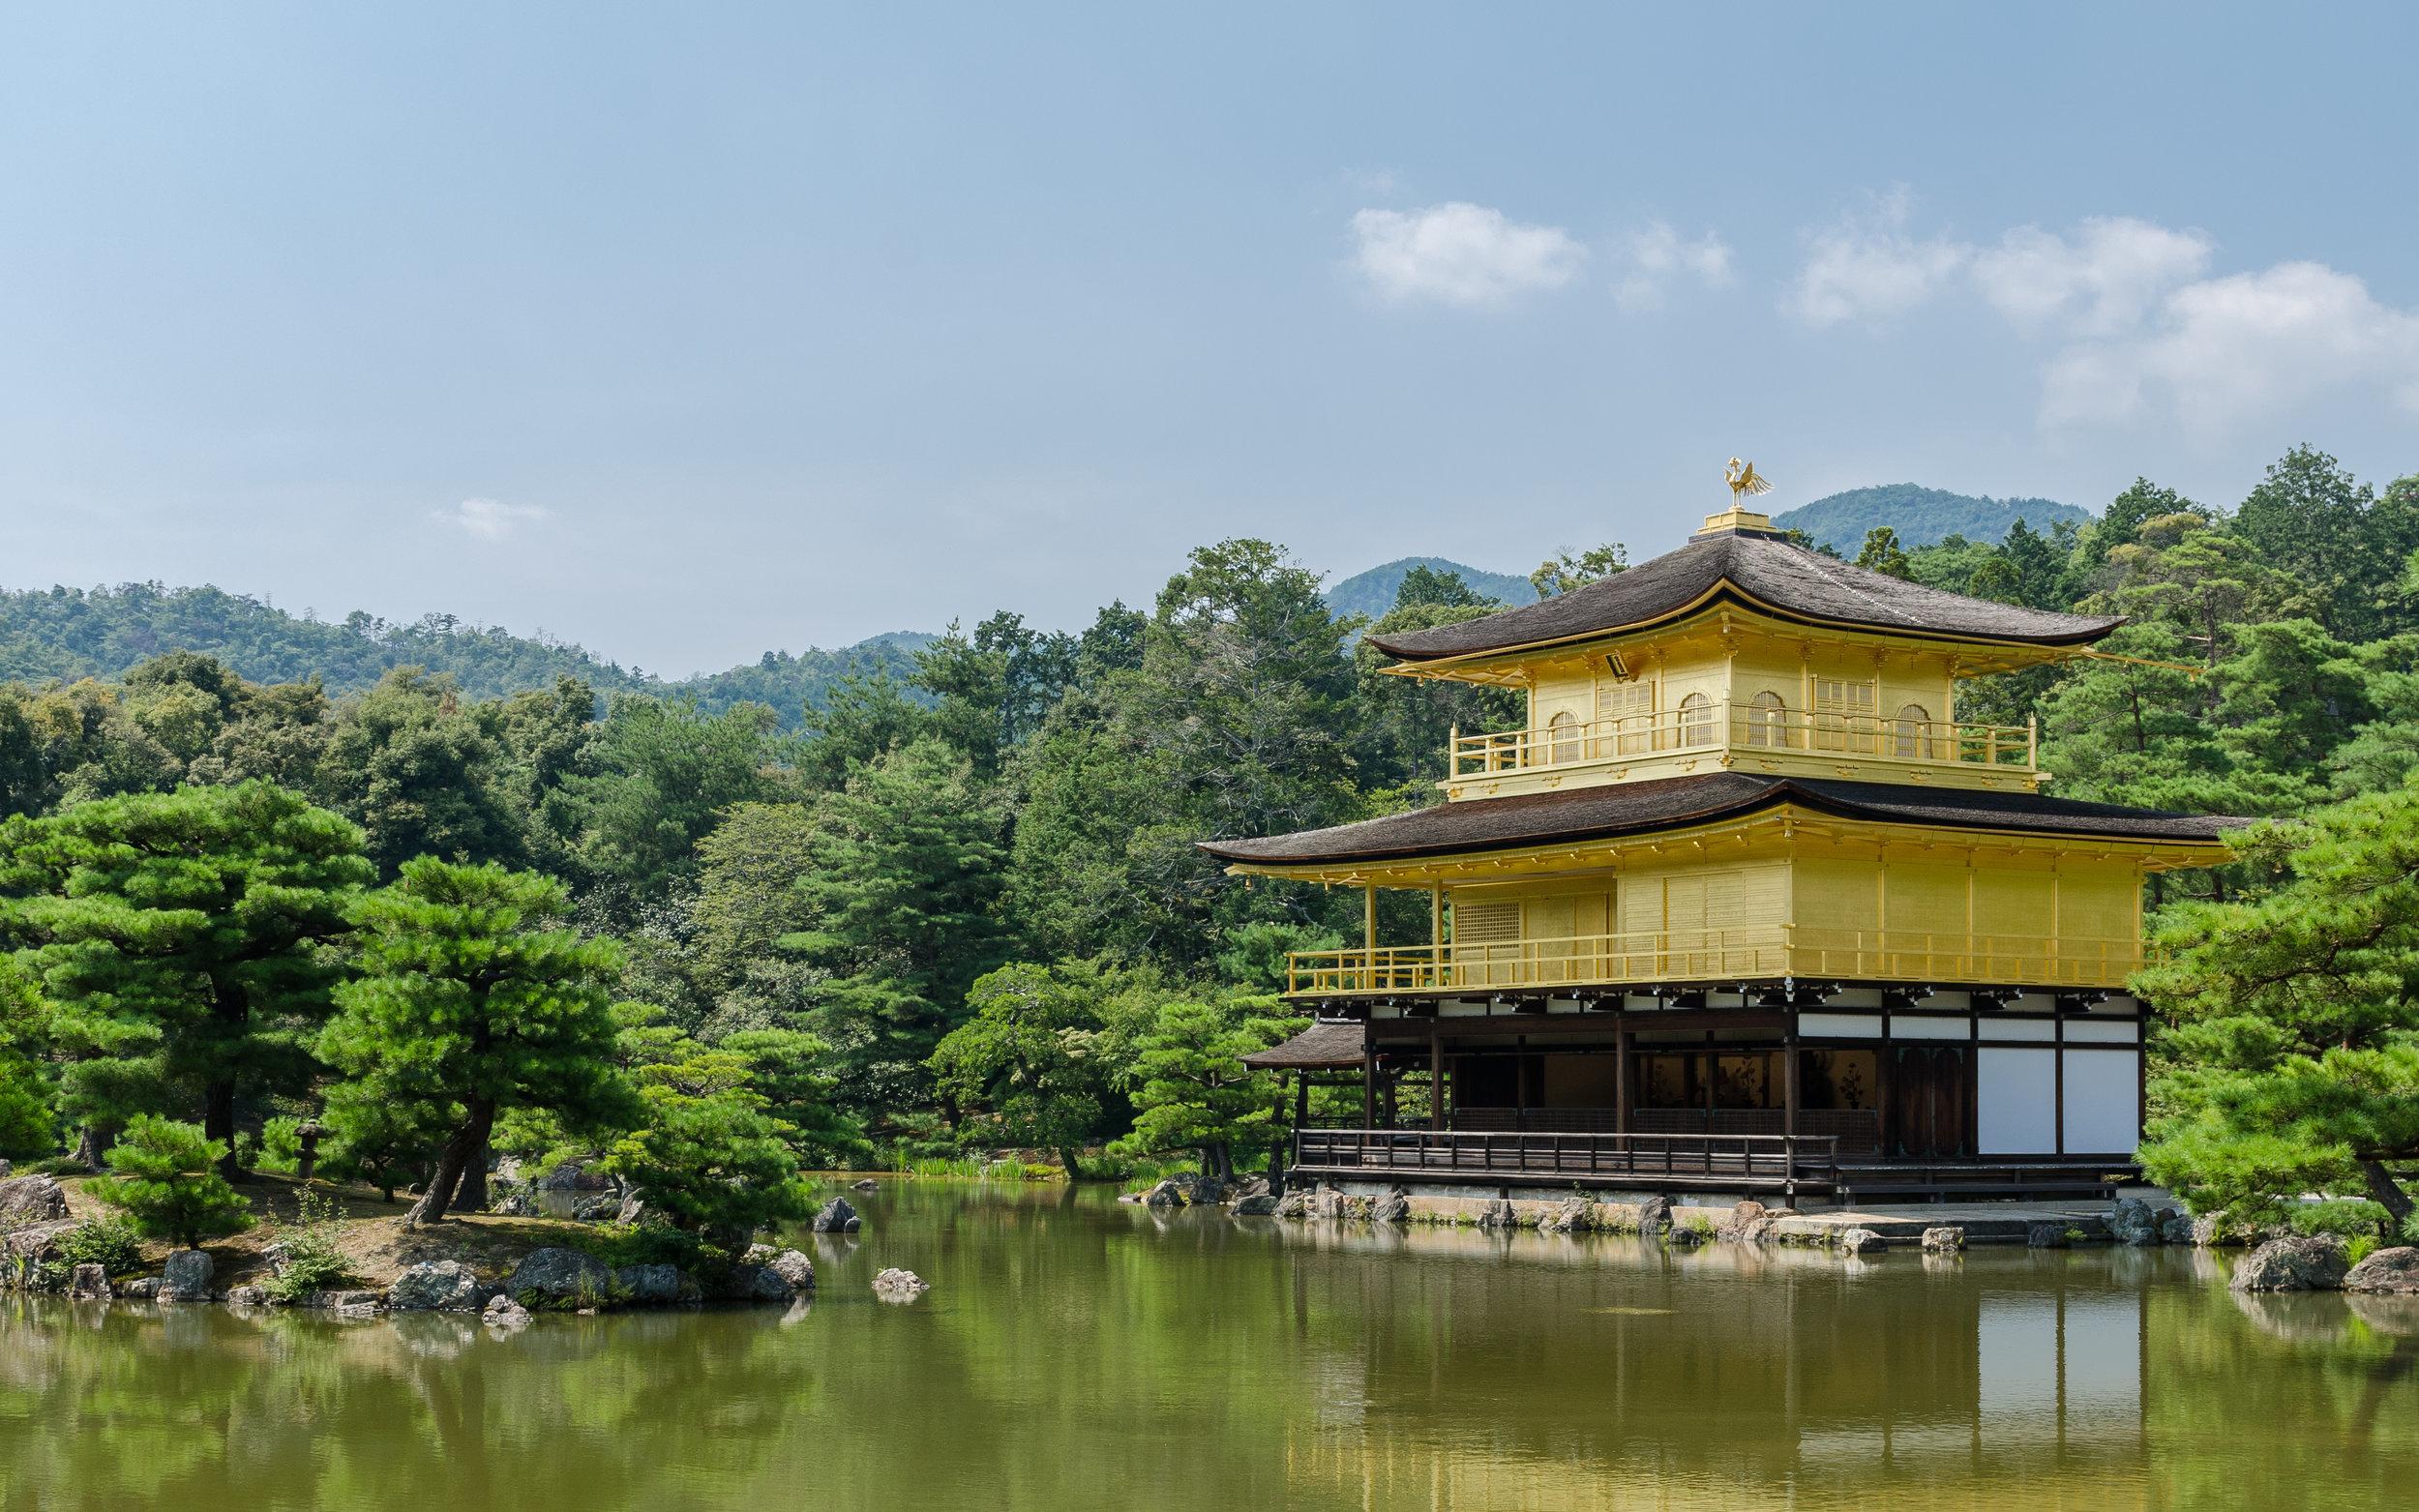 Shariden,_Kinkaku-ji,_Kyoto,_East_View_20130811_1.jpg